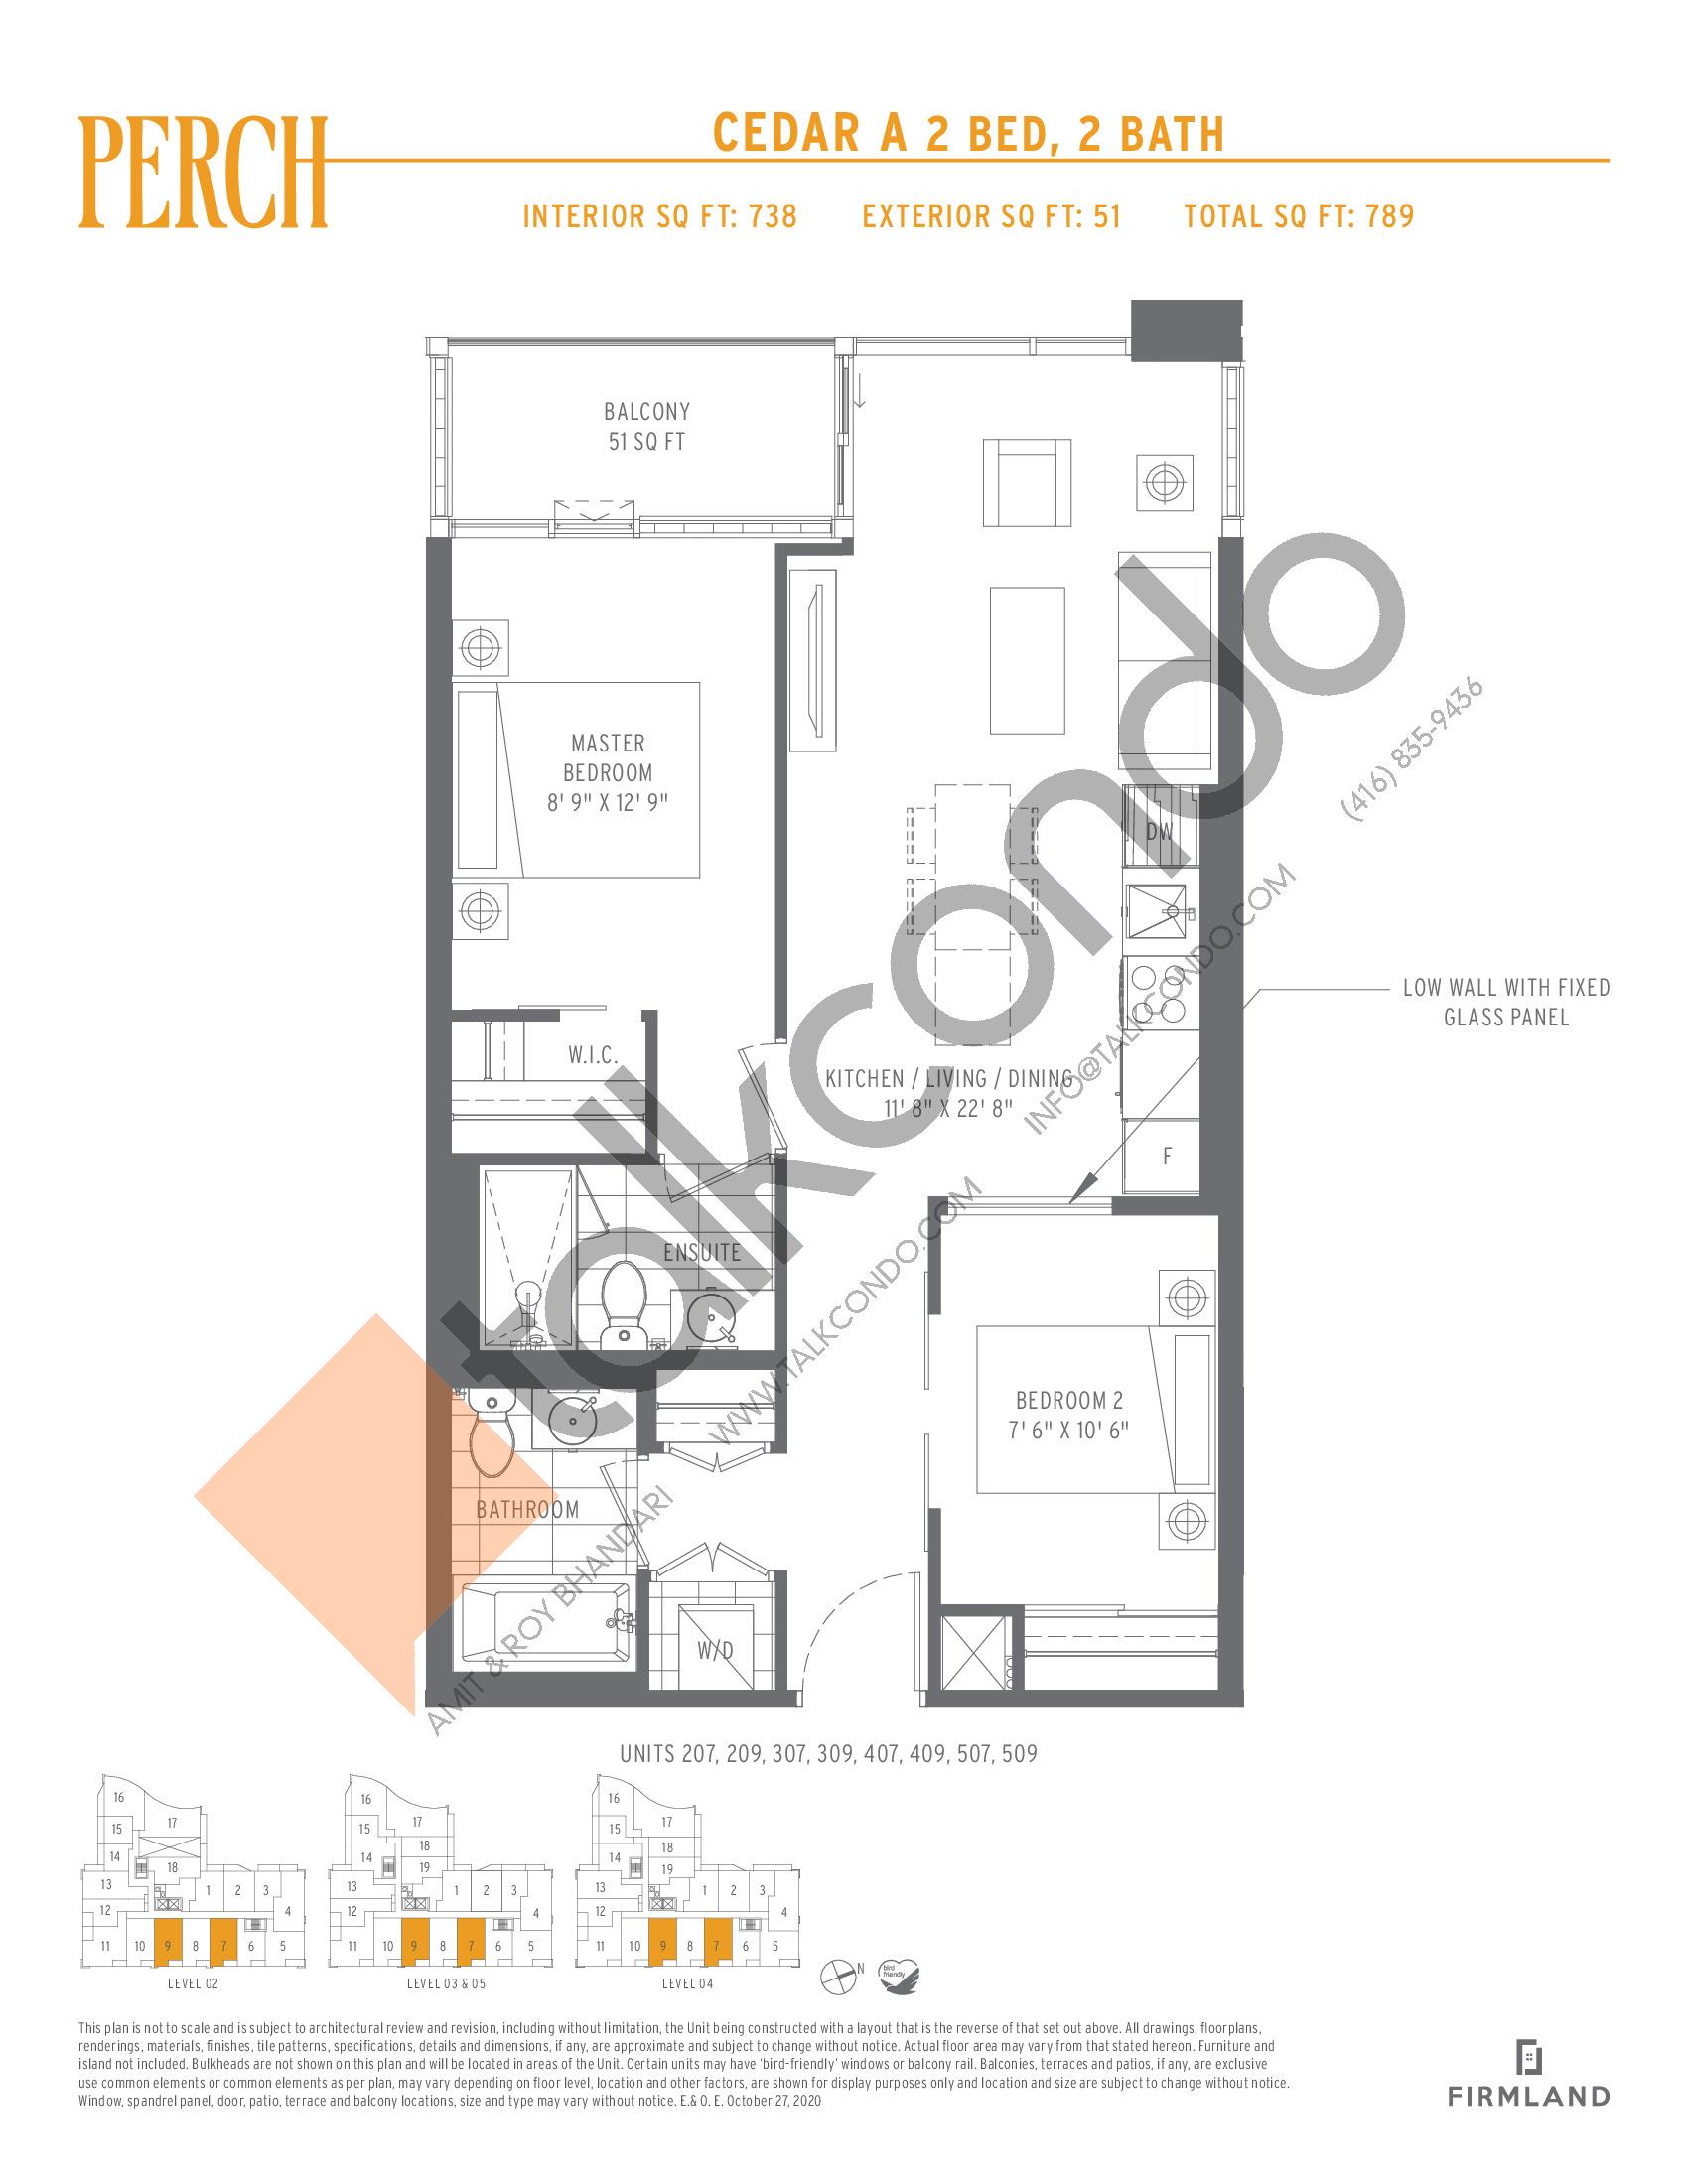 Cedar A Floor Plan at Perch Condos - 738 sq.ft